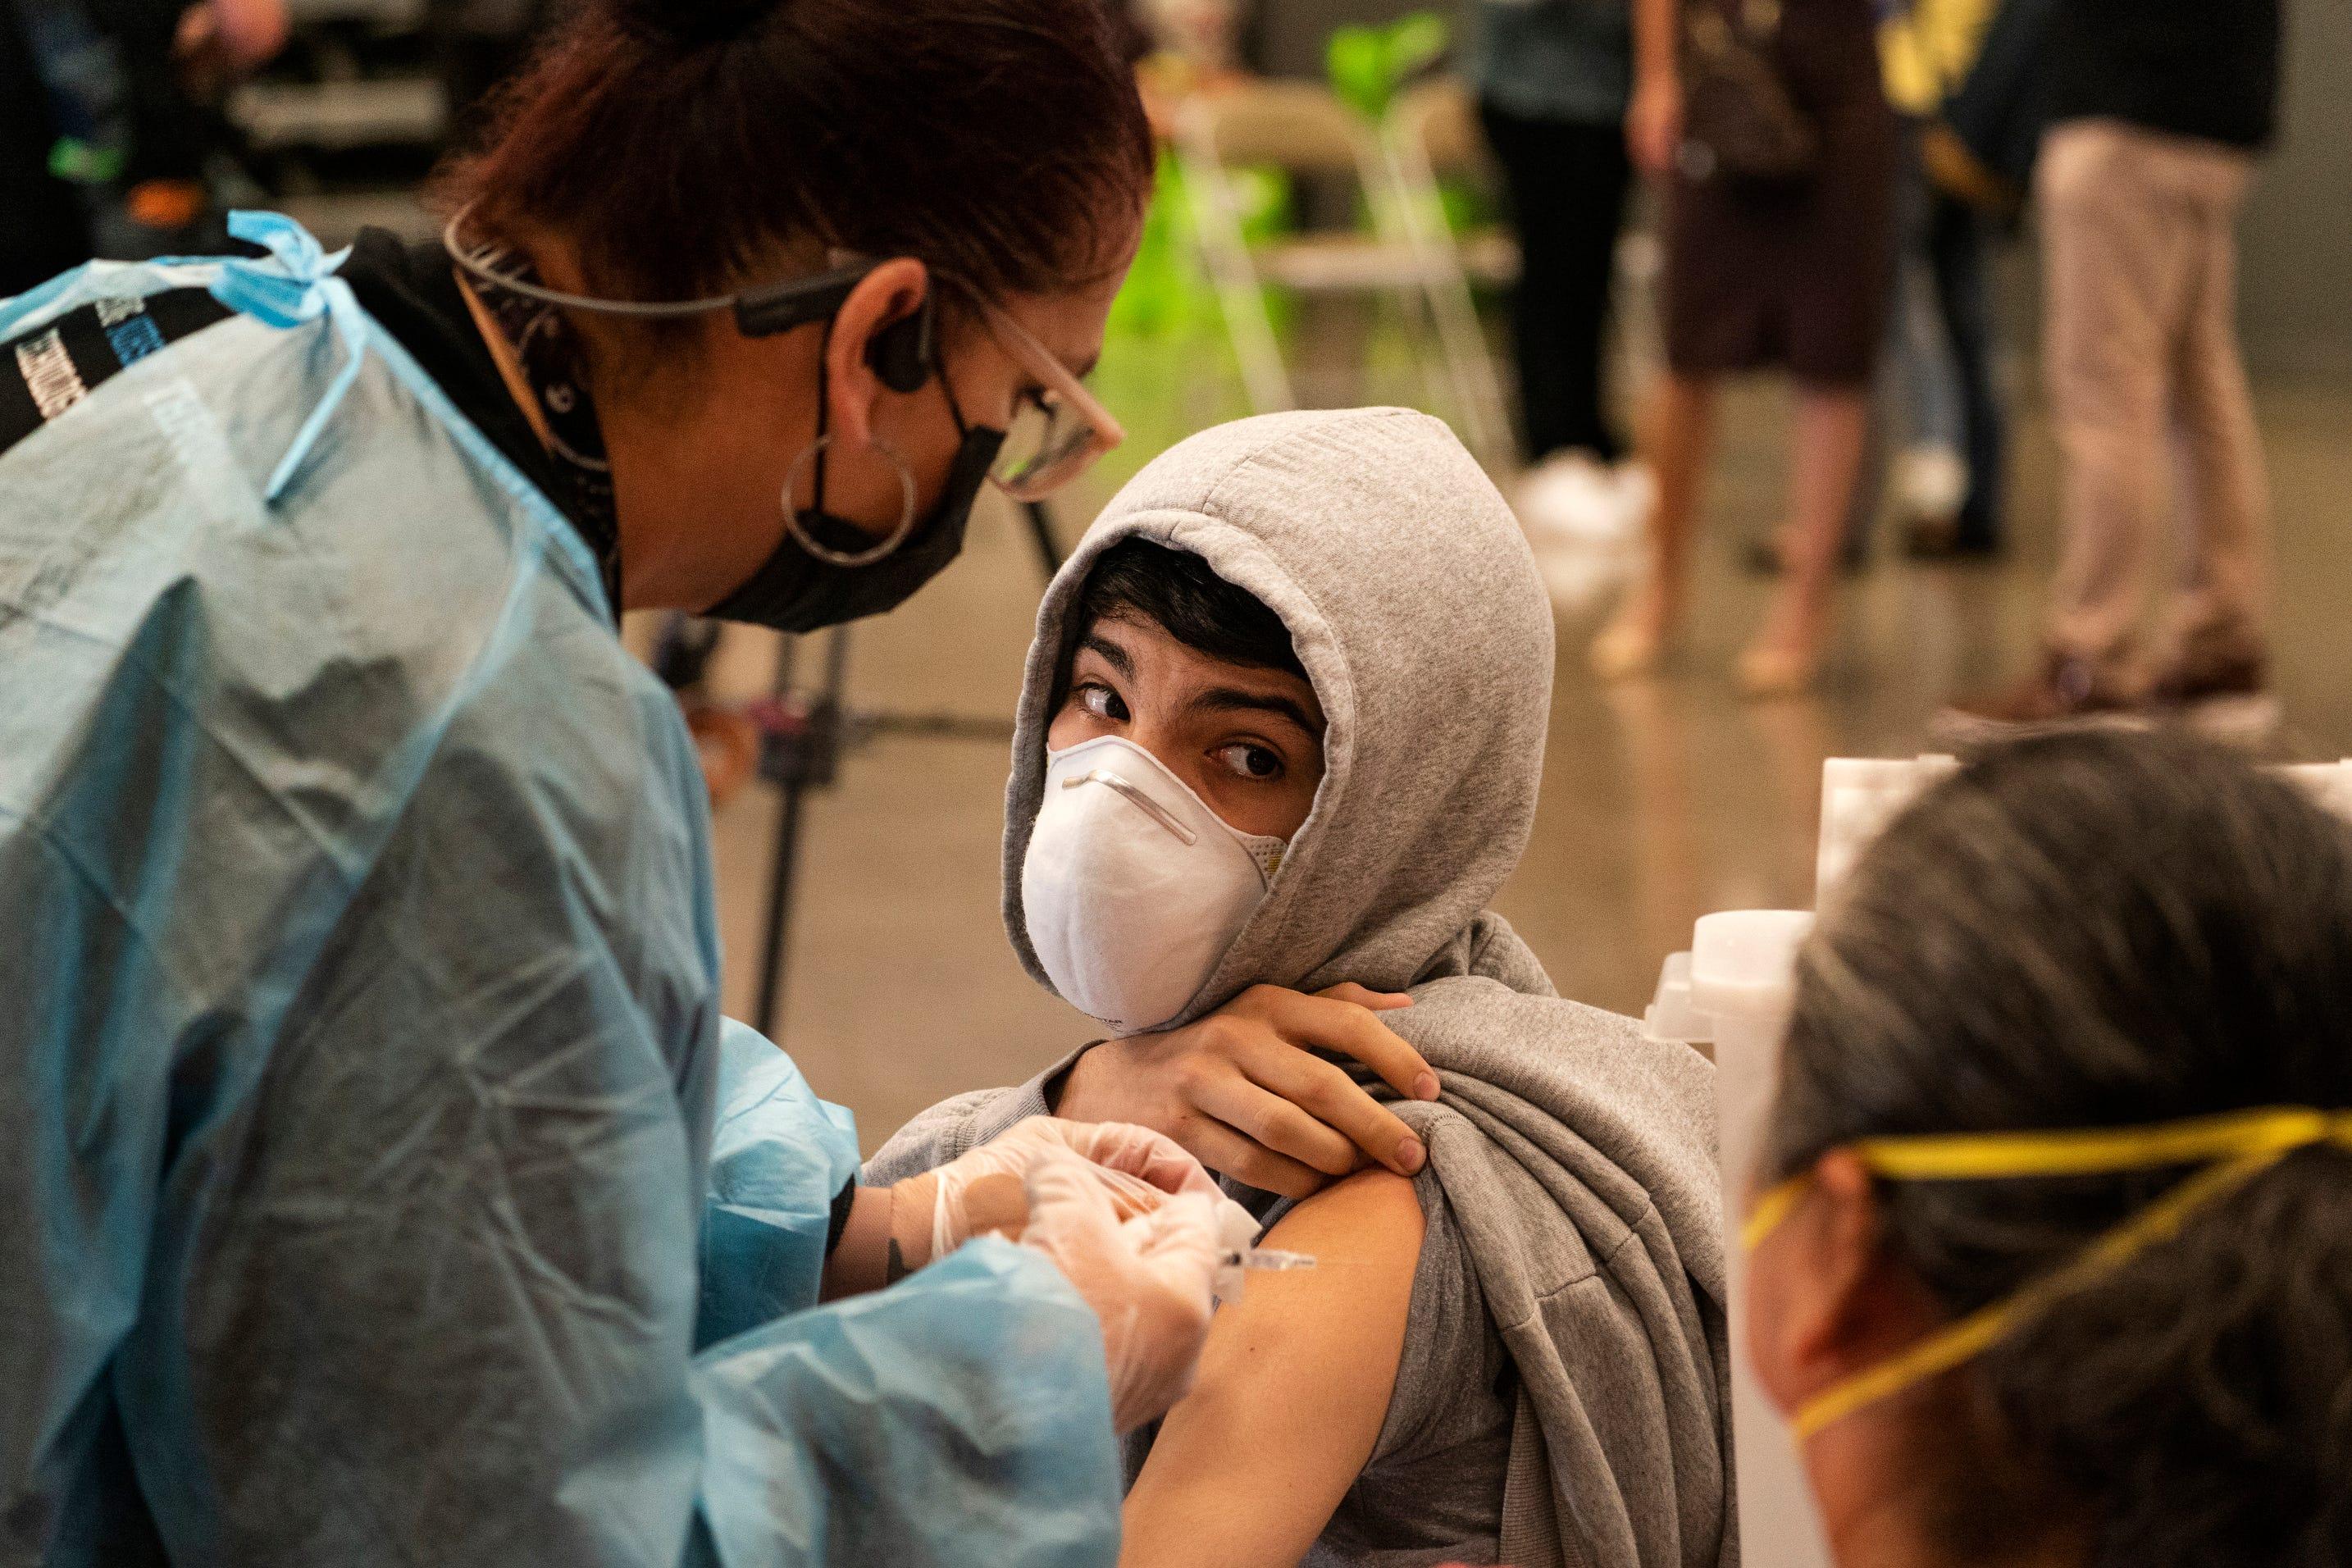 Biden praises federal endorsement of booster shot; African leaders decry  vaccine apartheid : COVID-19 updates